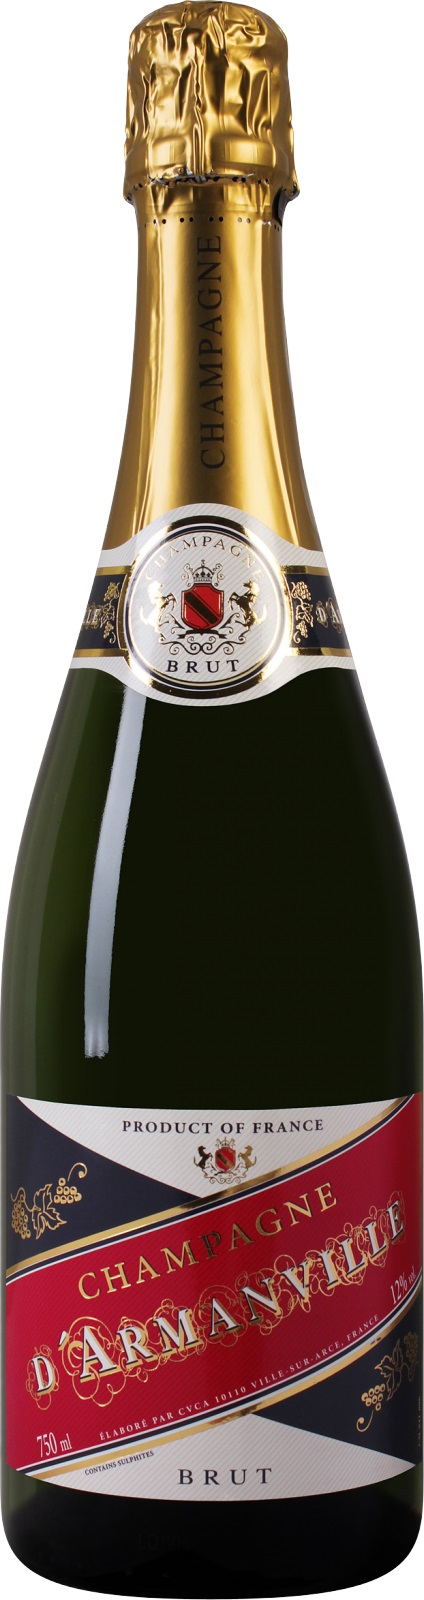 champagne-brut-darmanville-aoc-6ks.jpg